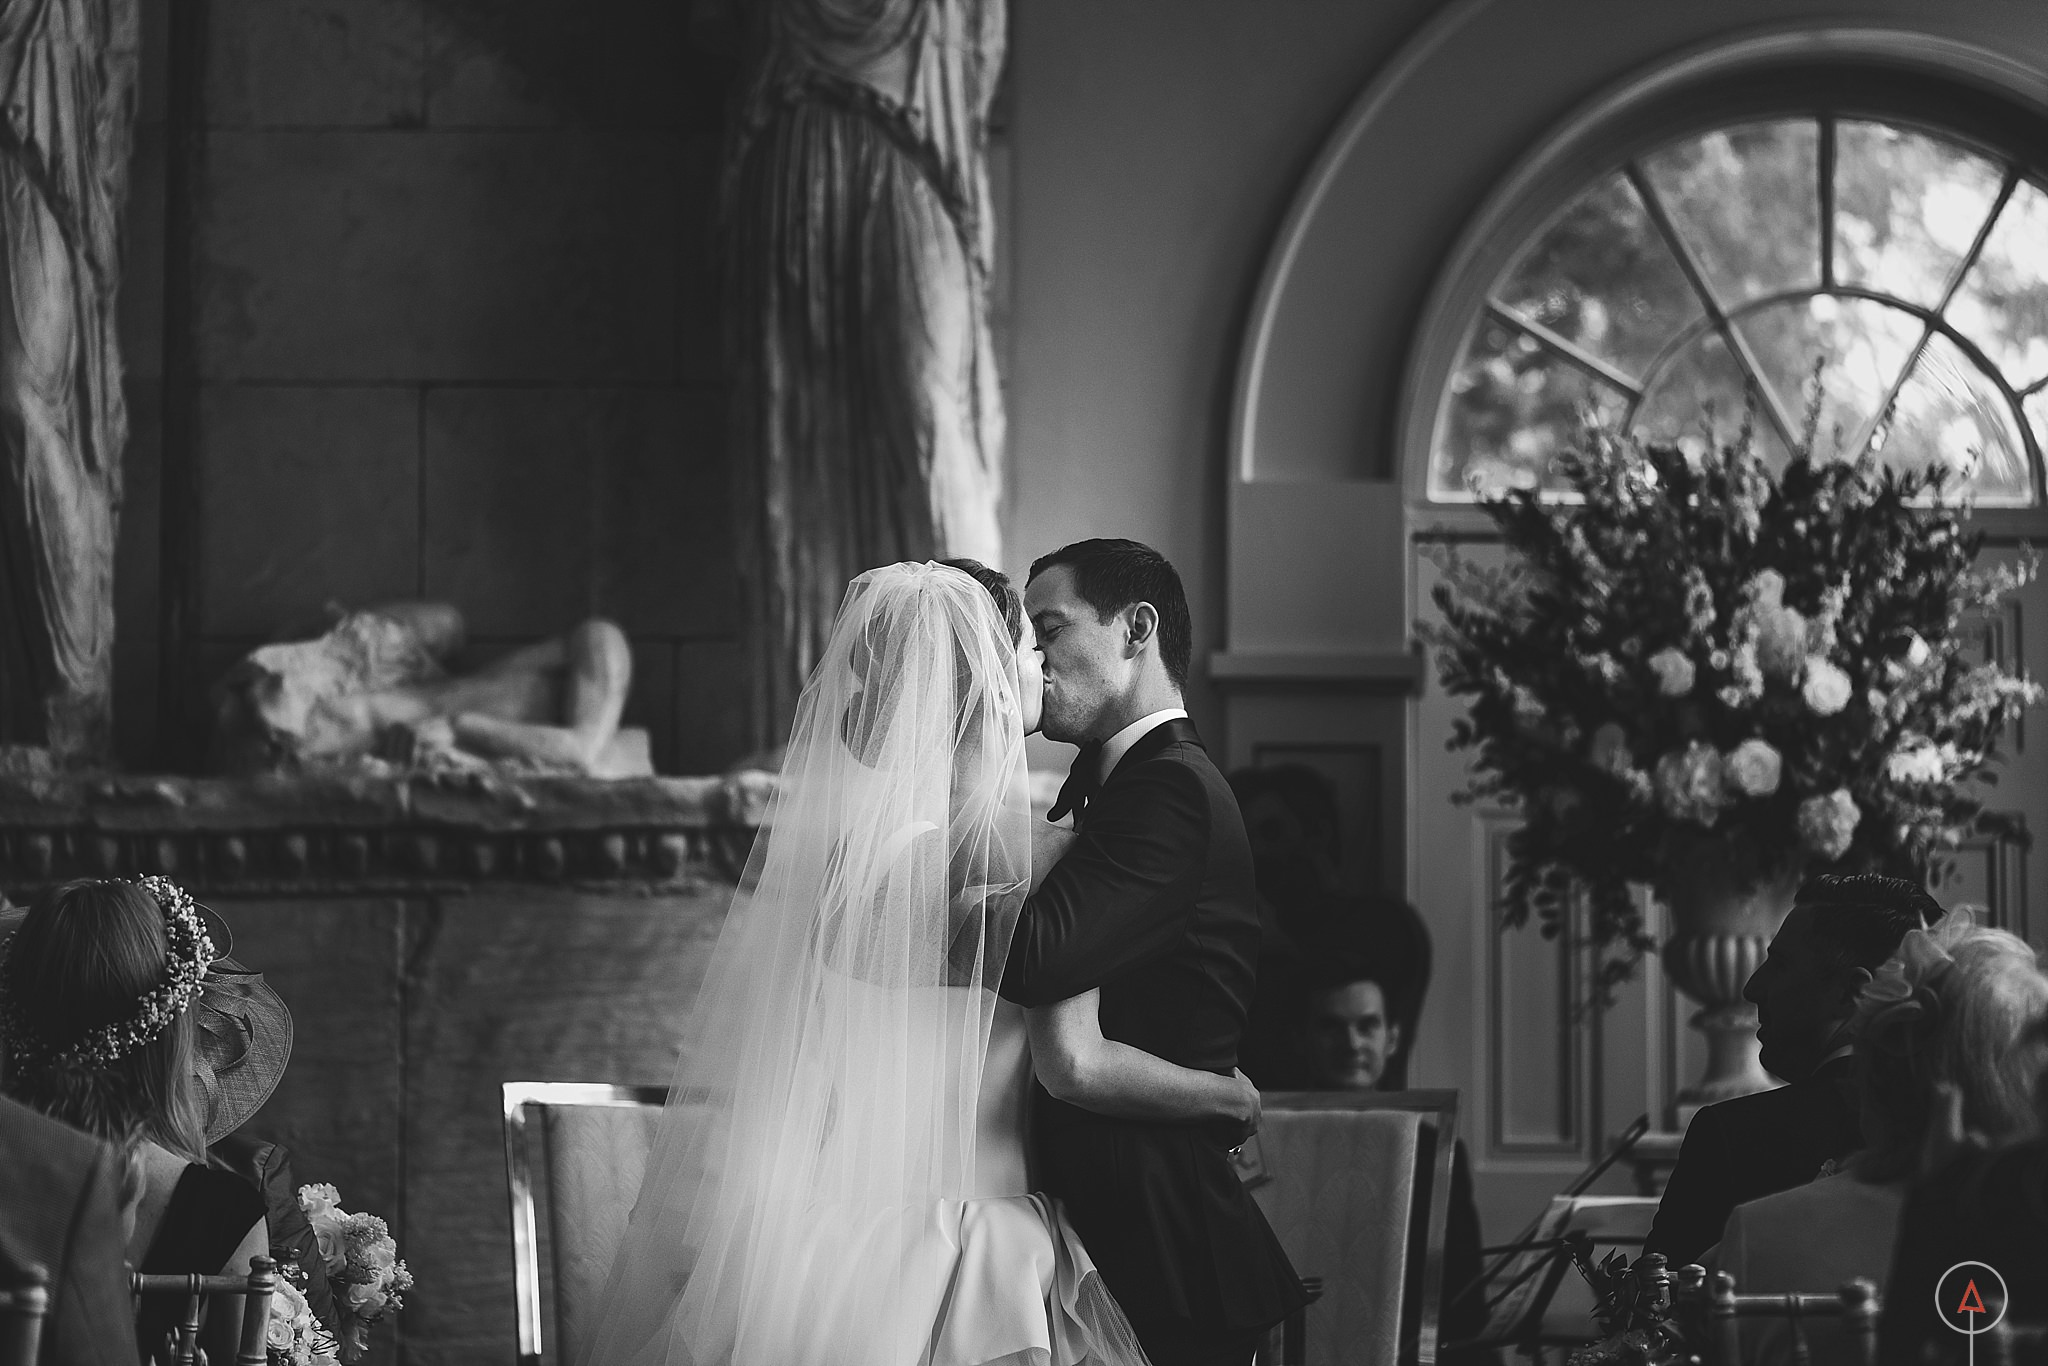 cardiff-wedding-photographer-aga-tomaszek_0256